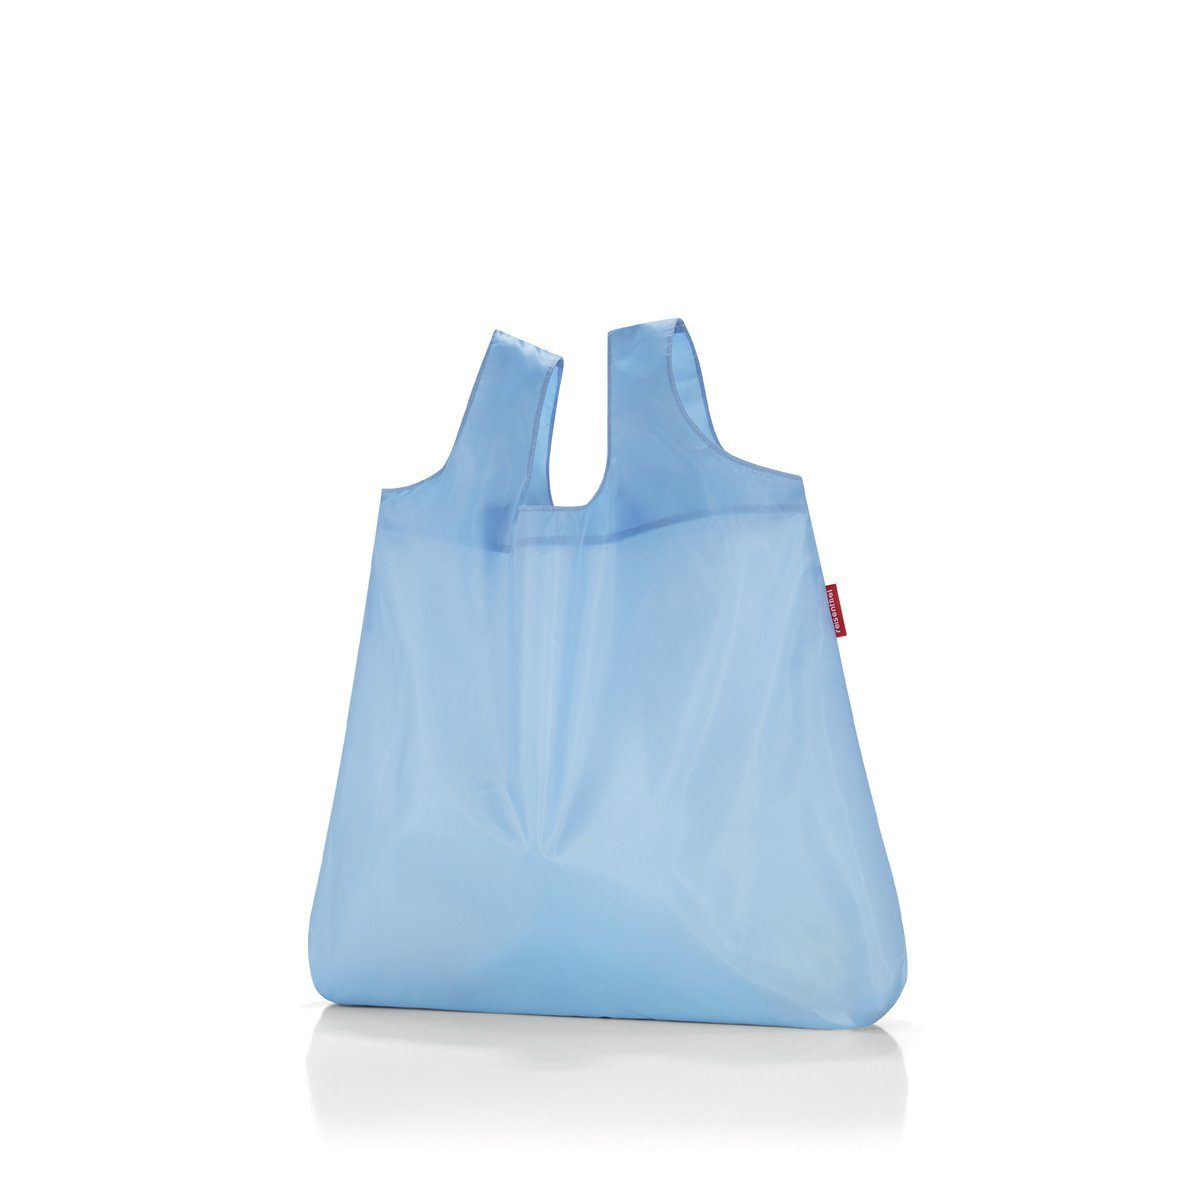 Reisenthel® Reisenthel MINI MAXI SHOPPER old style pastel blue